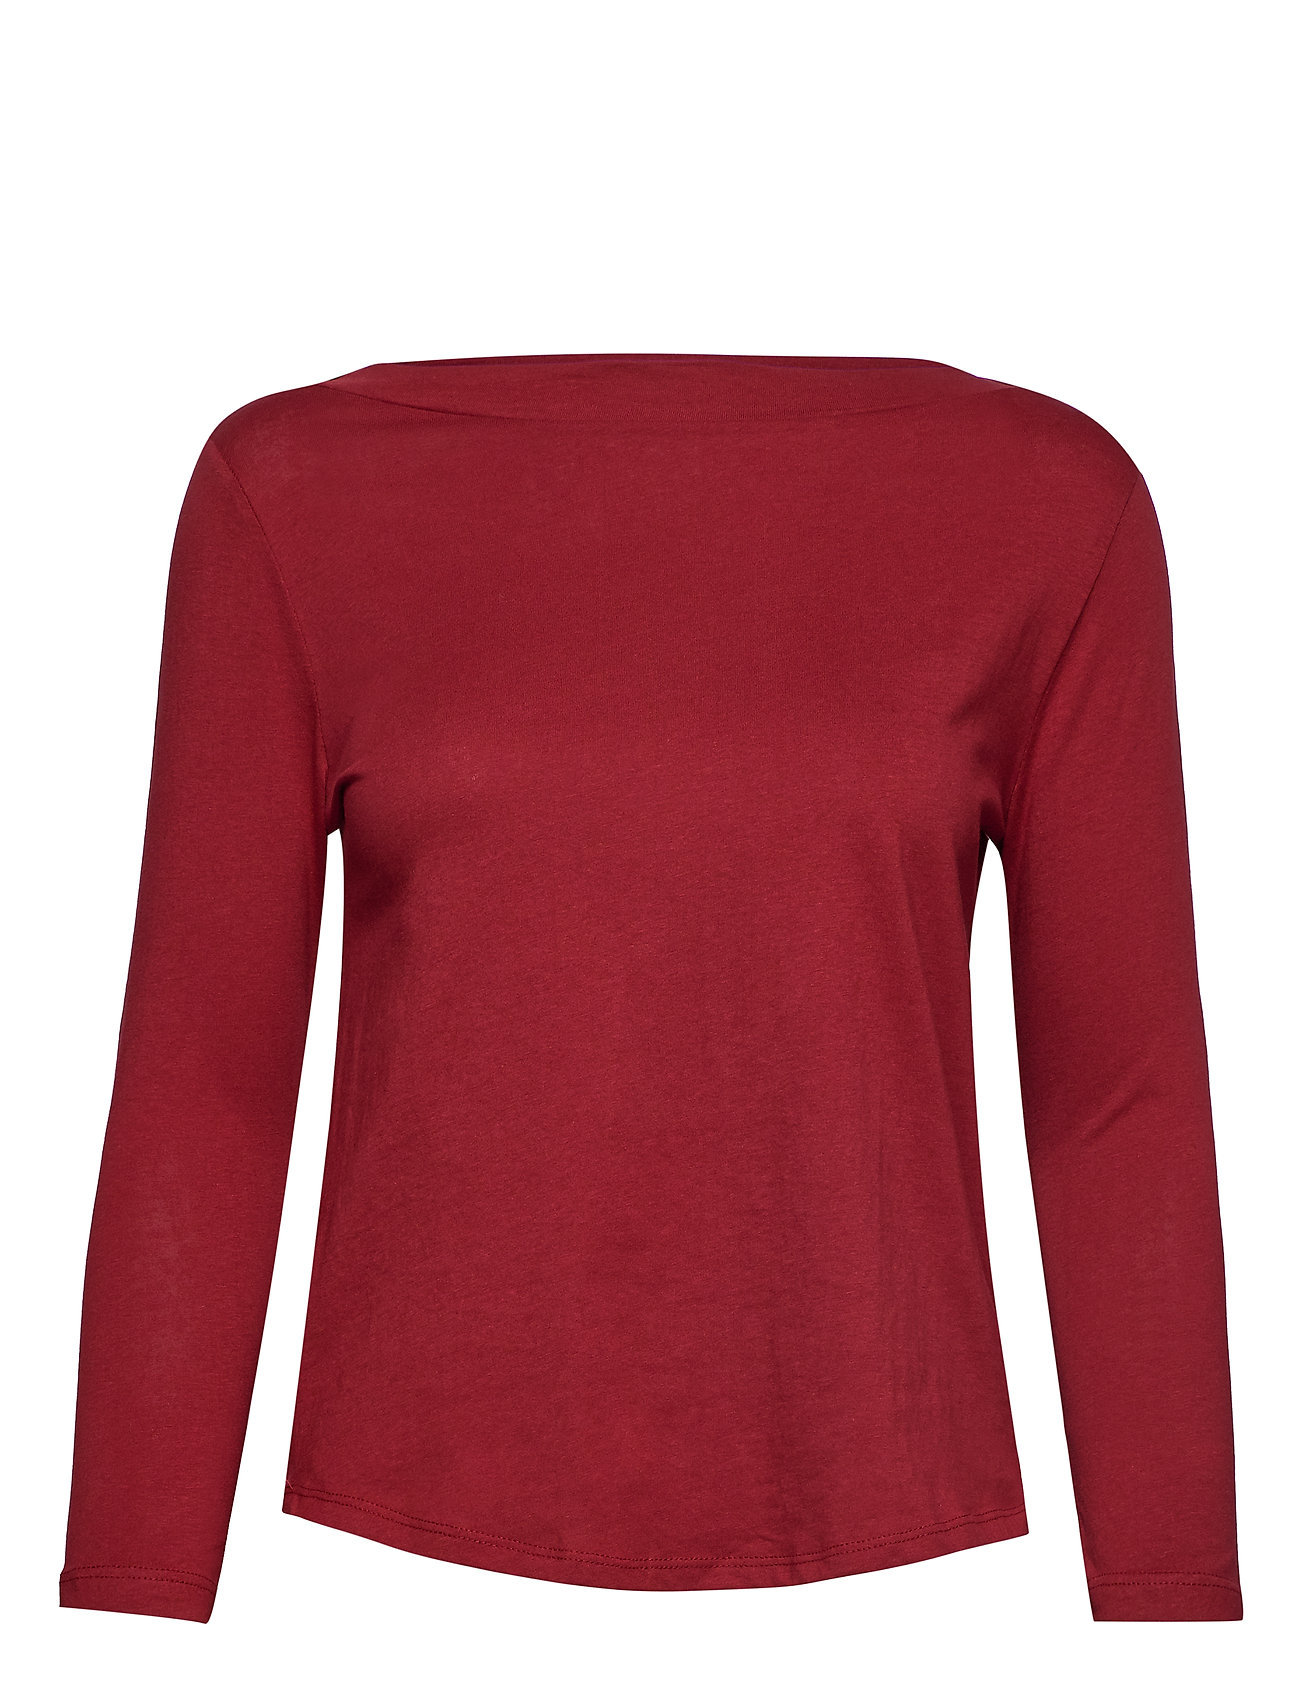 Mango Organic cotton t-shirt - DARK RED